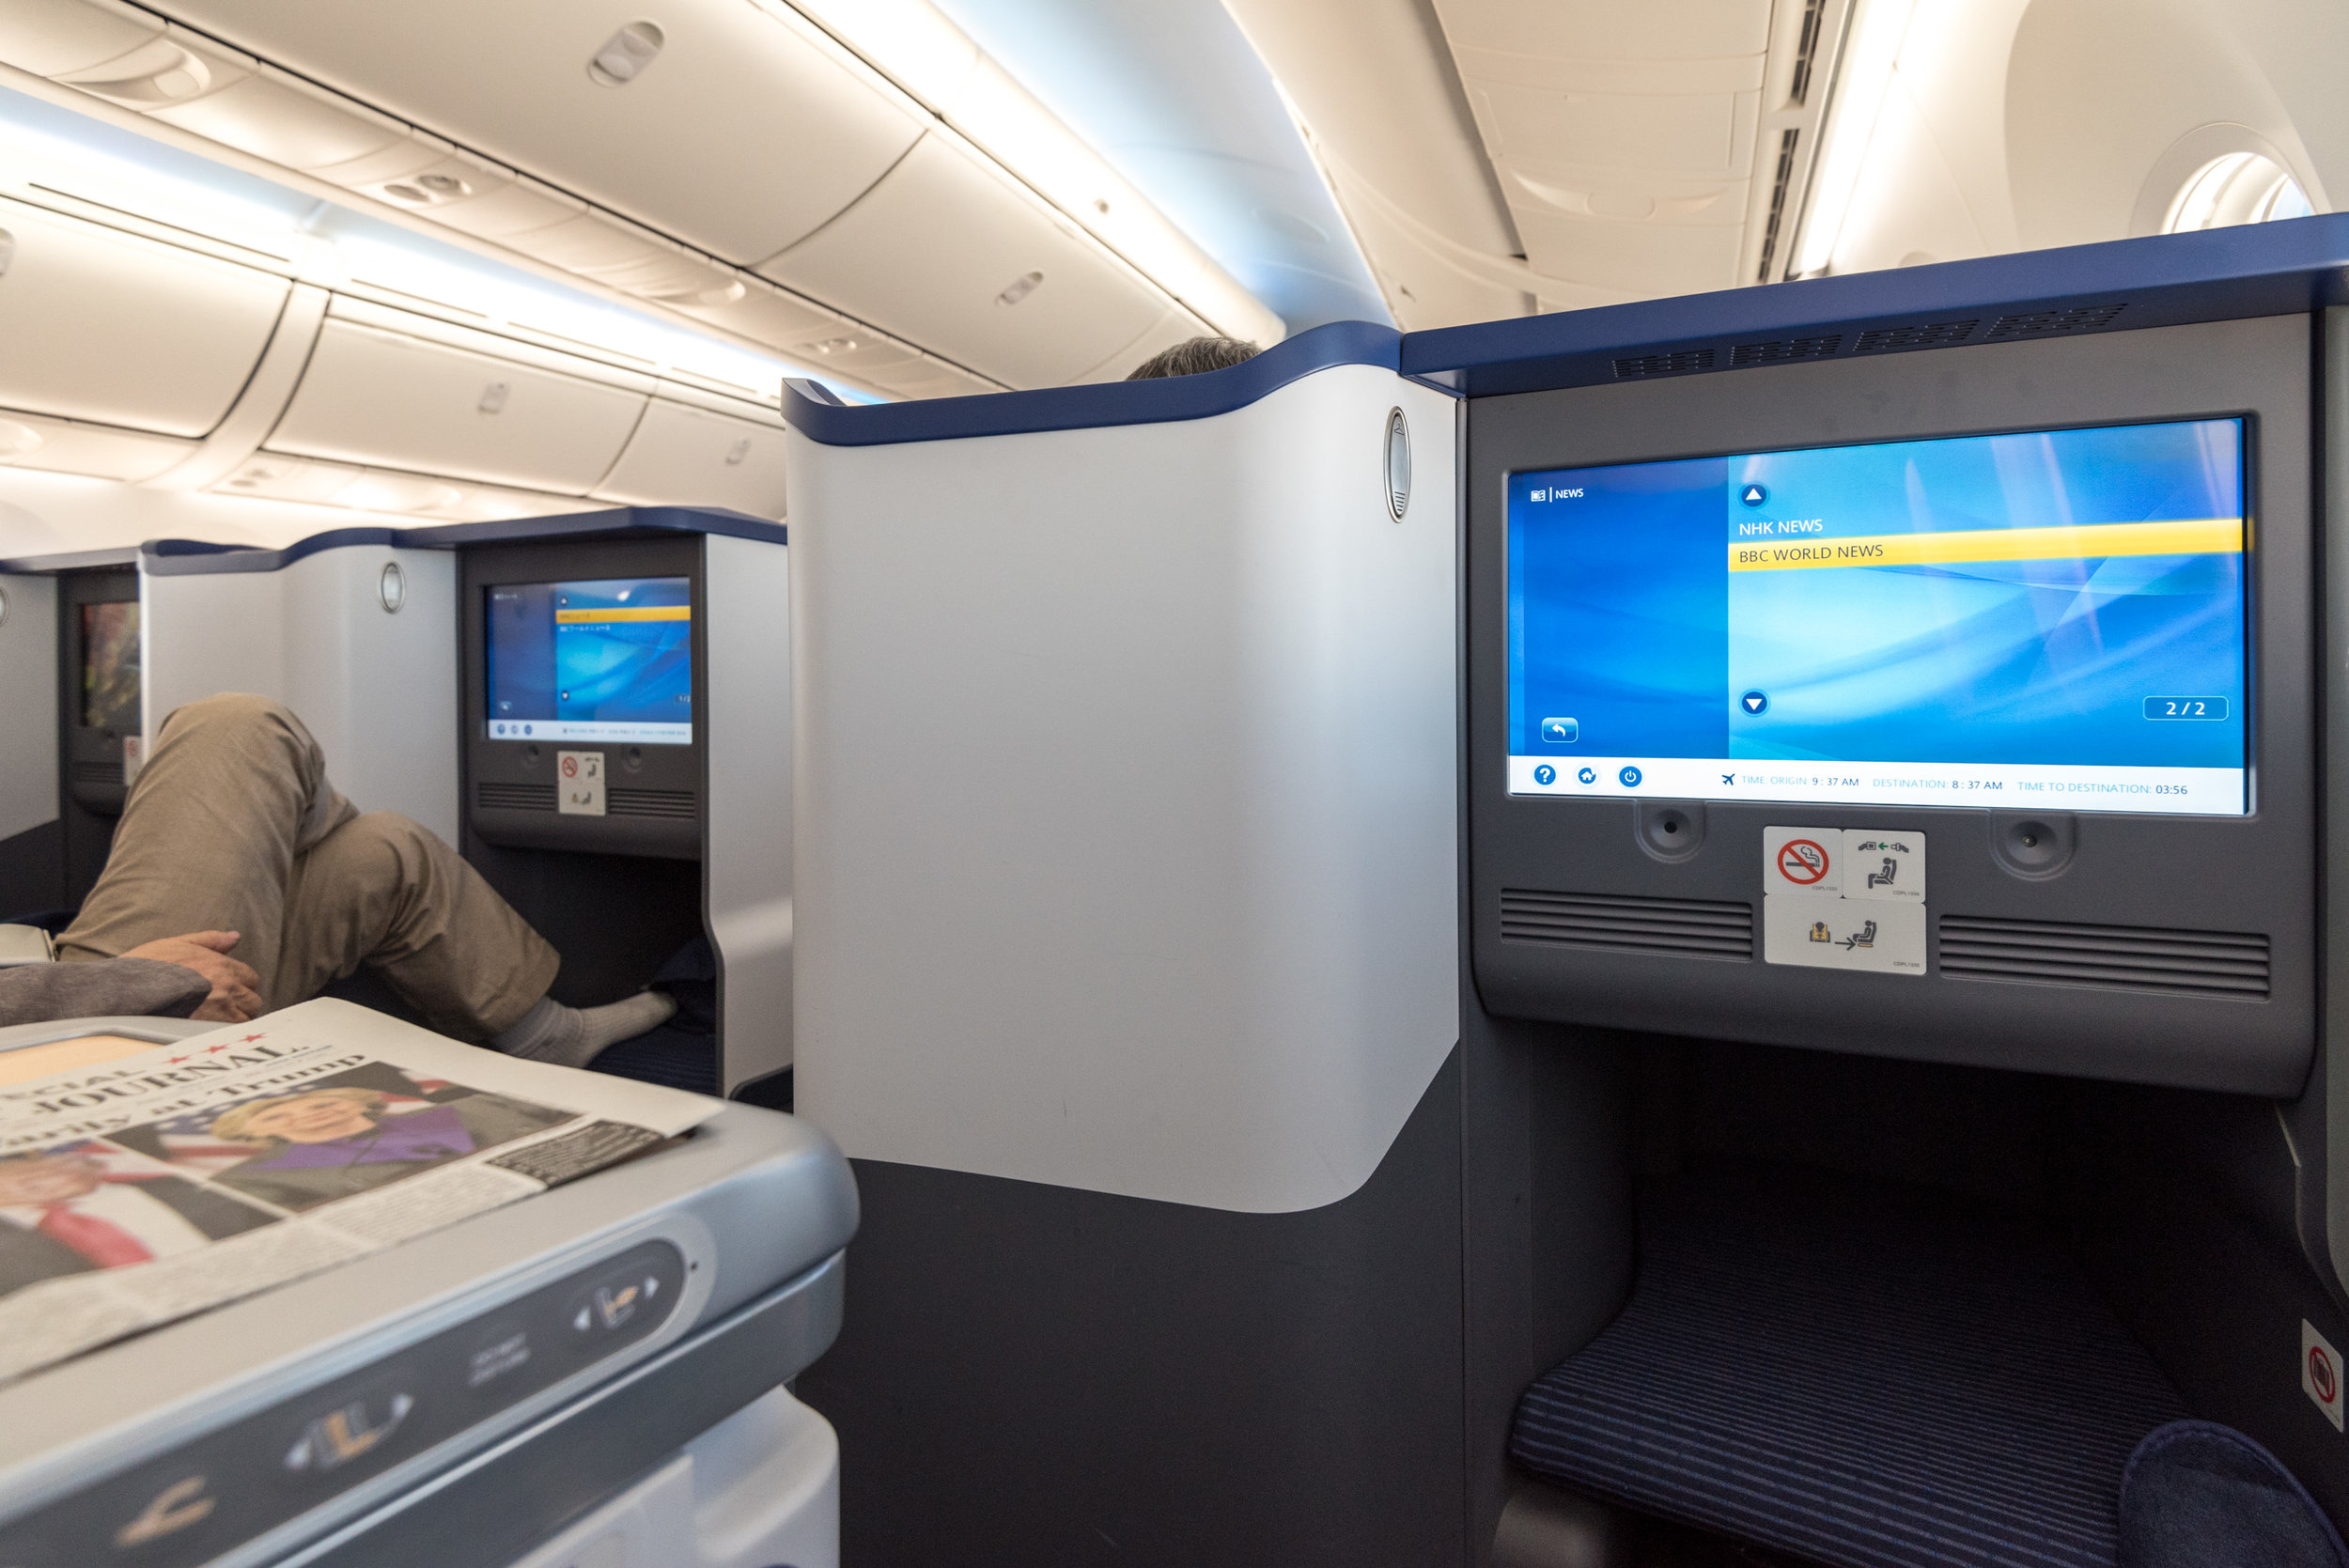 Seat 11K  ANA Business Class 787-900 - NH859 (HND-HKG)